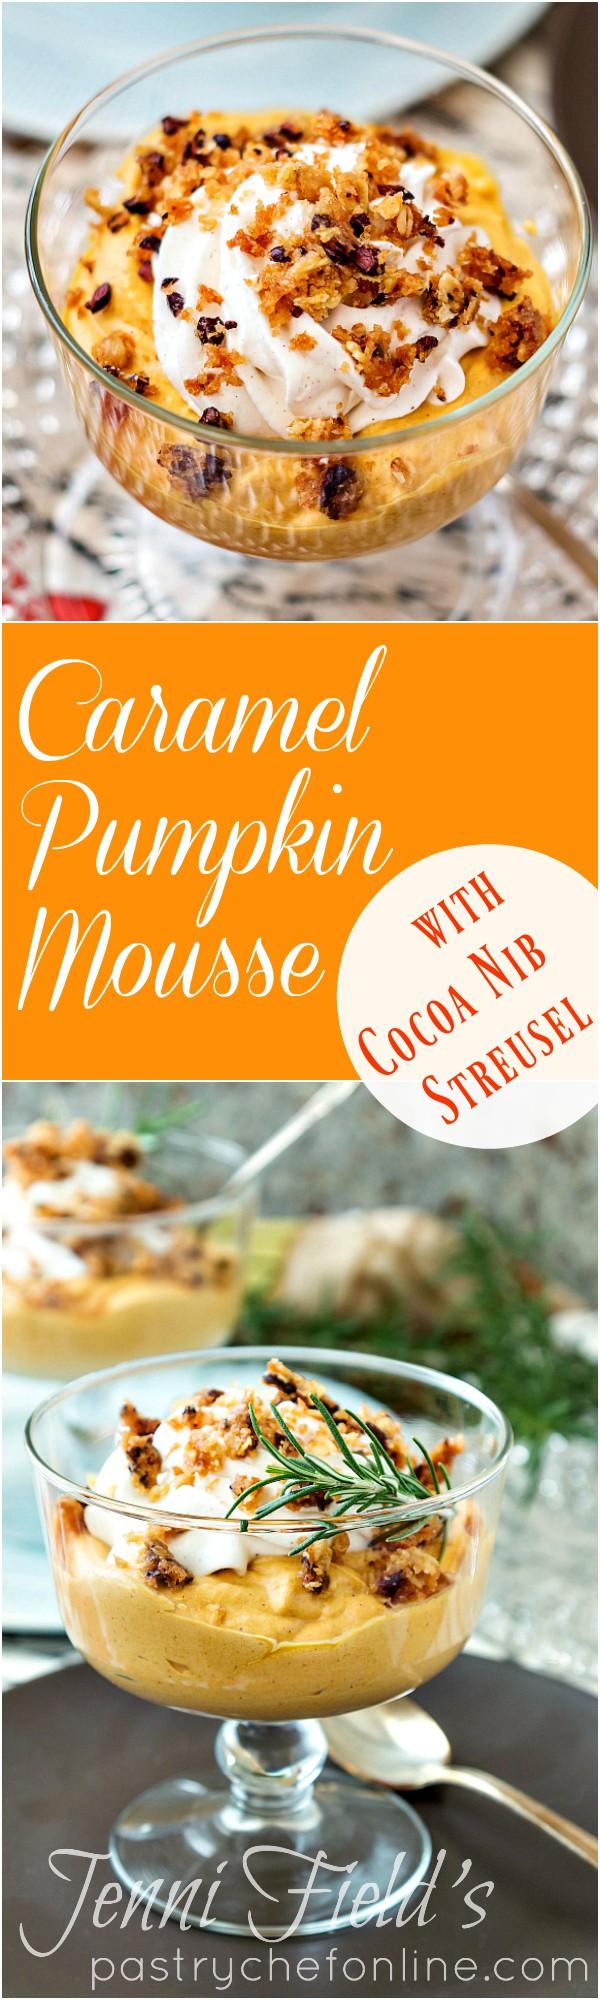 caramel-pumpkin-mousse-collage